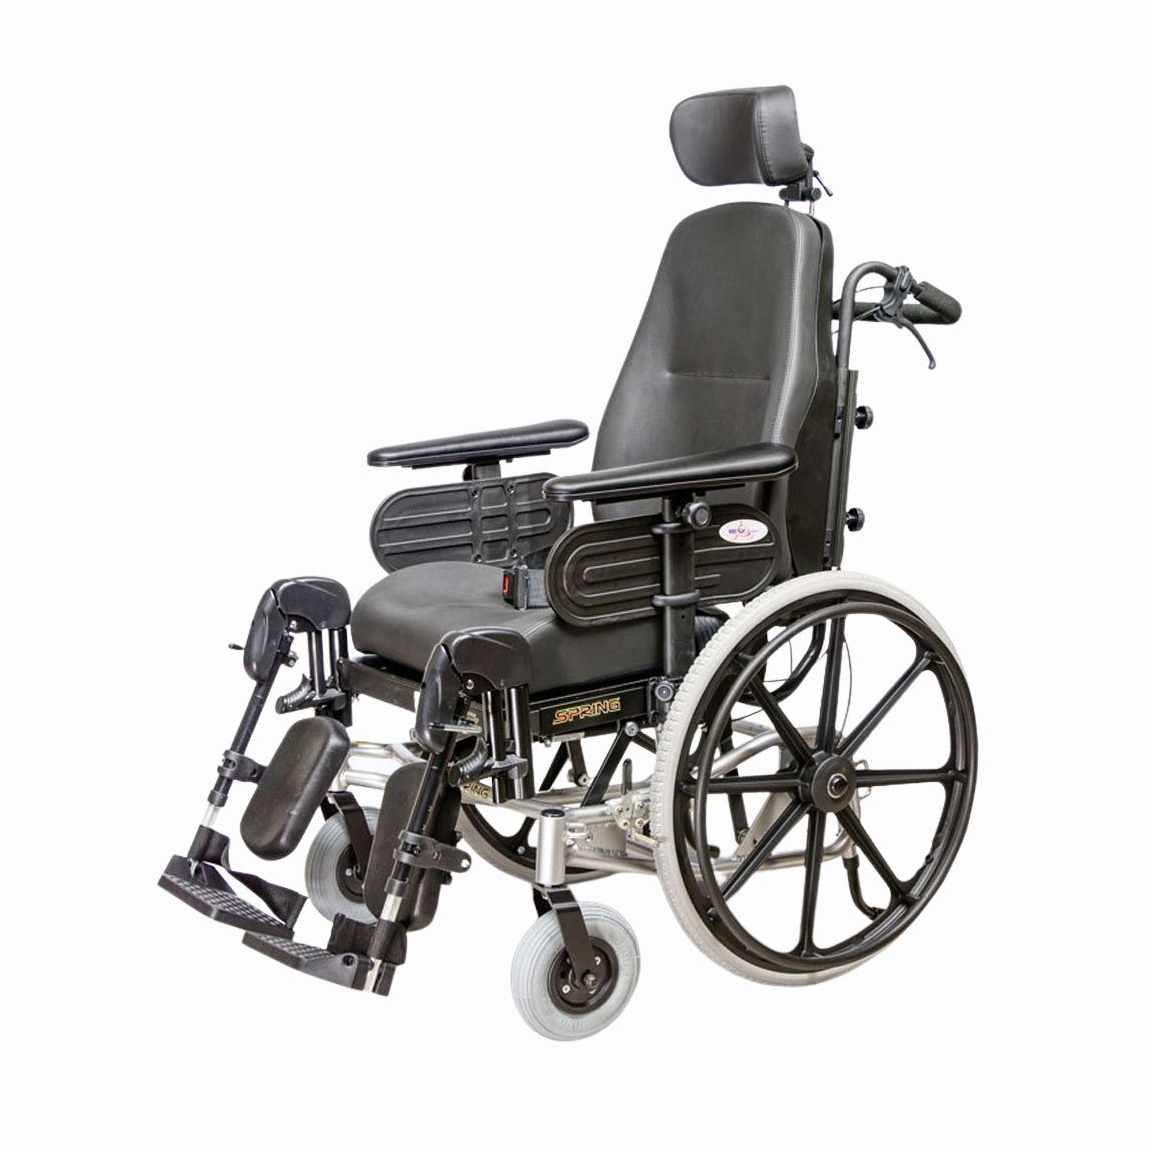 EV Rider Spring Lightweight Manual wheelchair